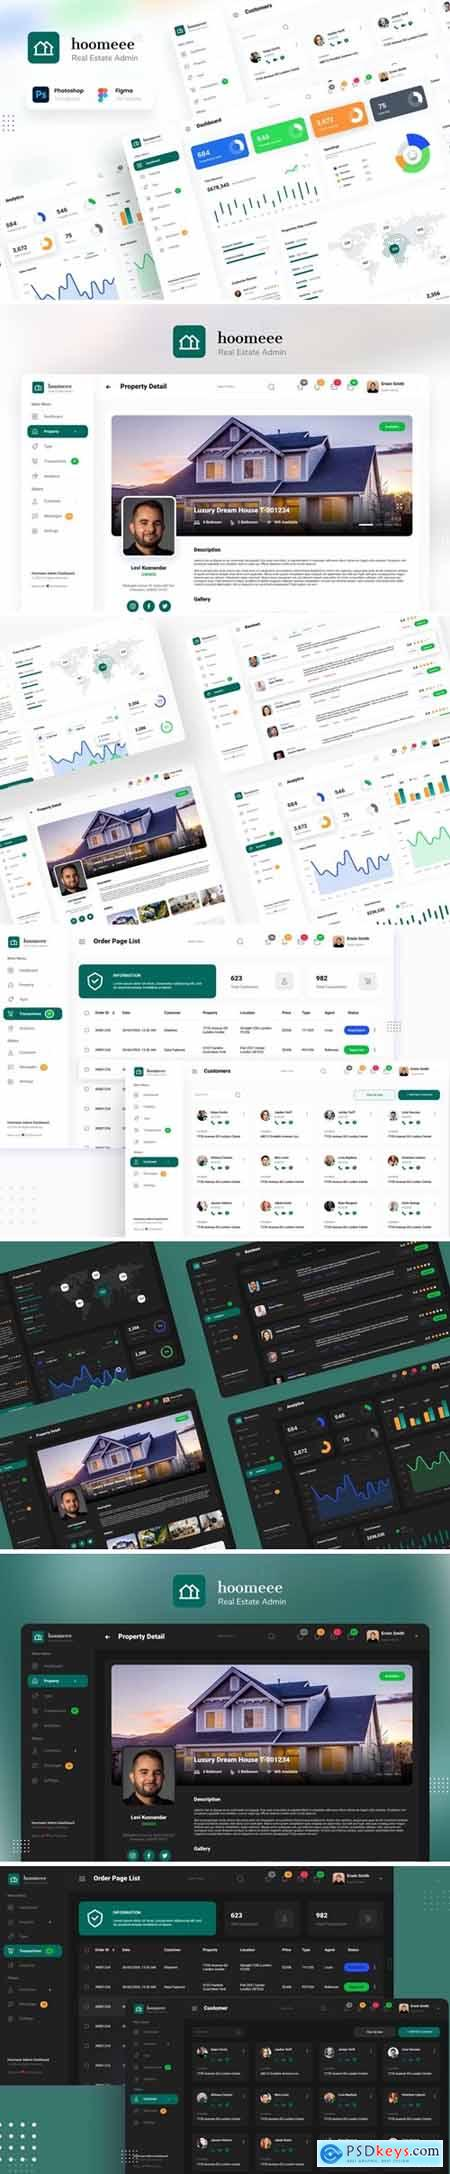 Hoomeee - Real Estate Admin Dashboard Template